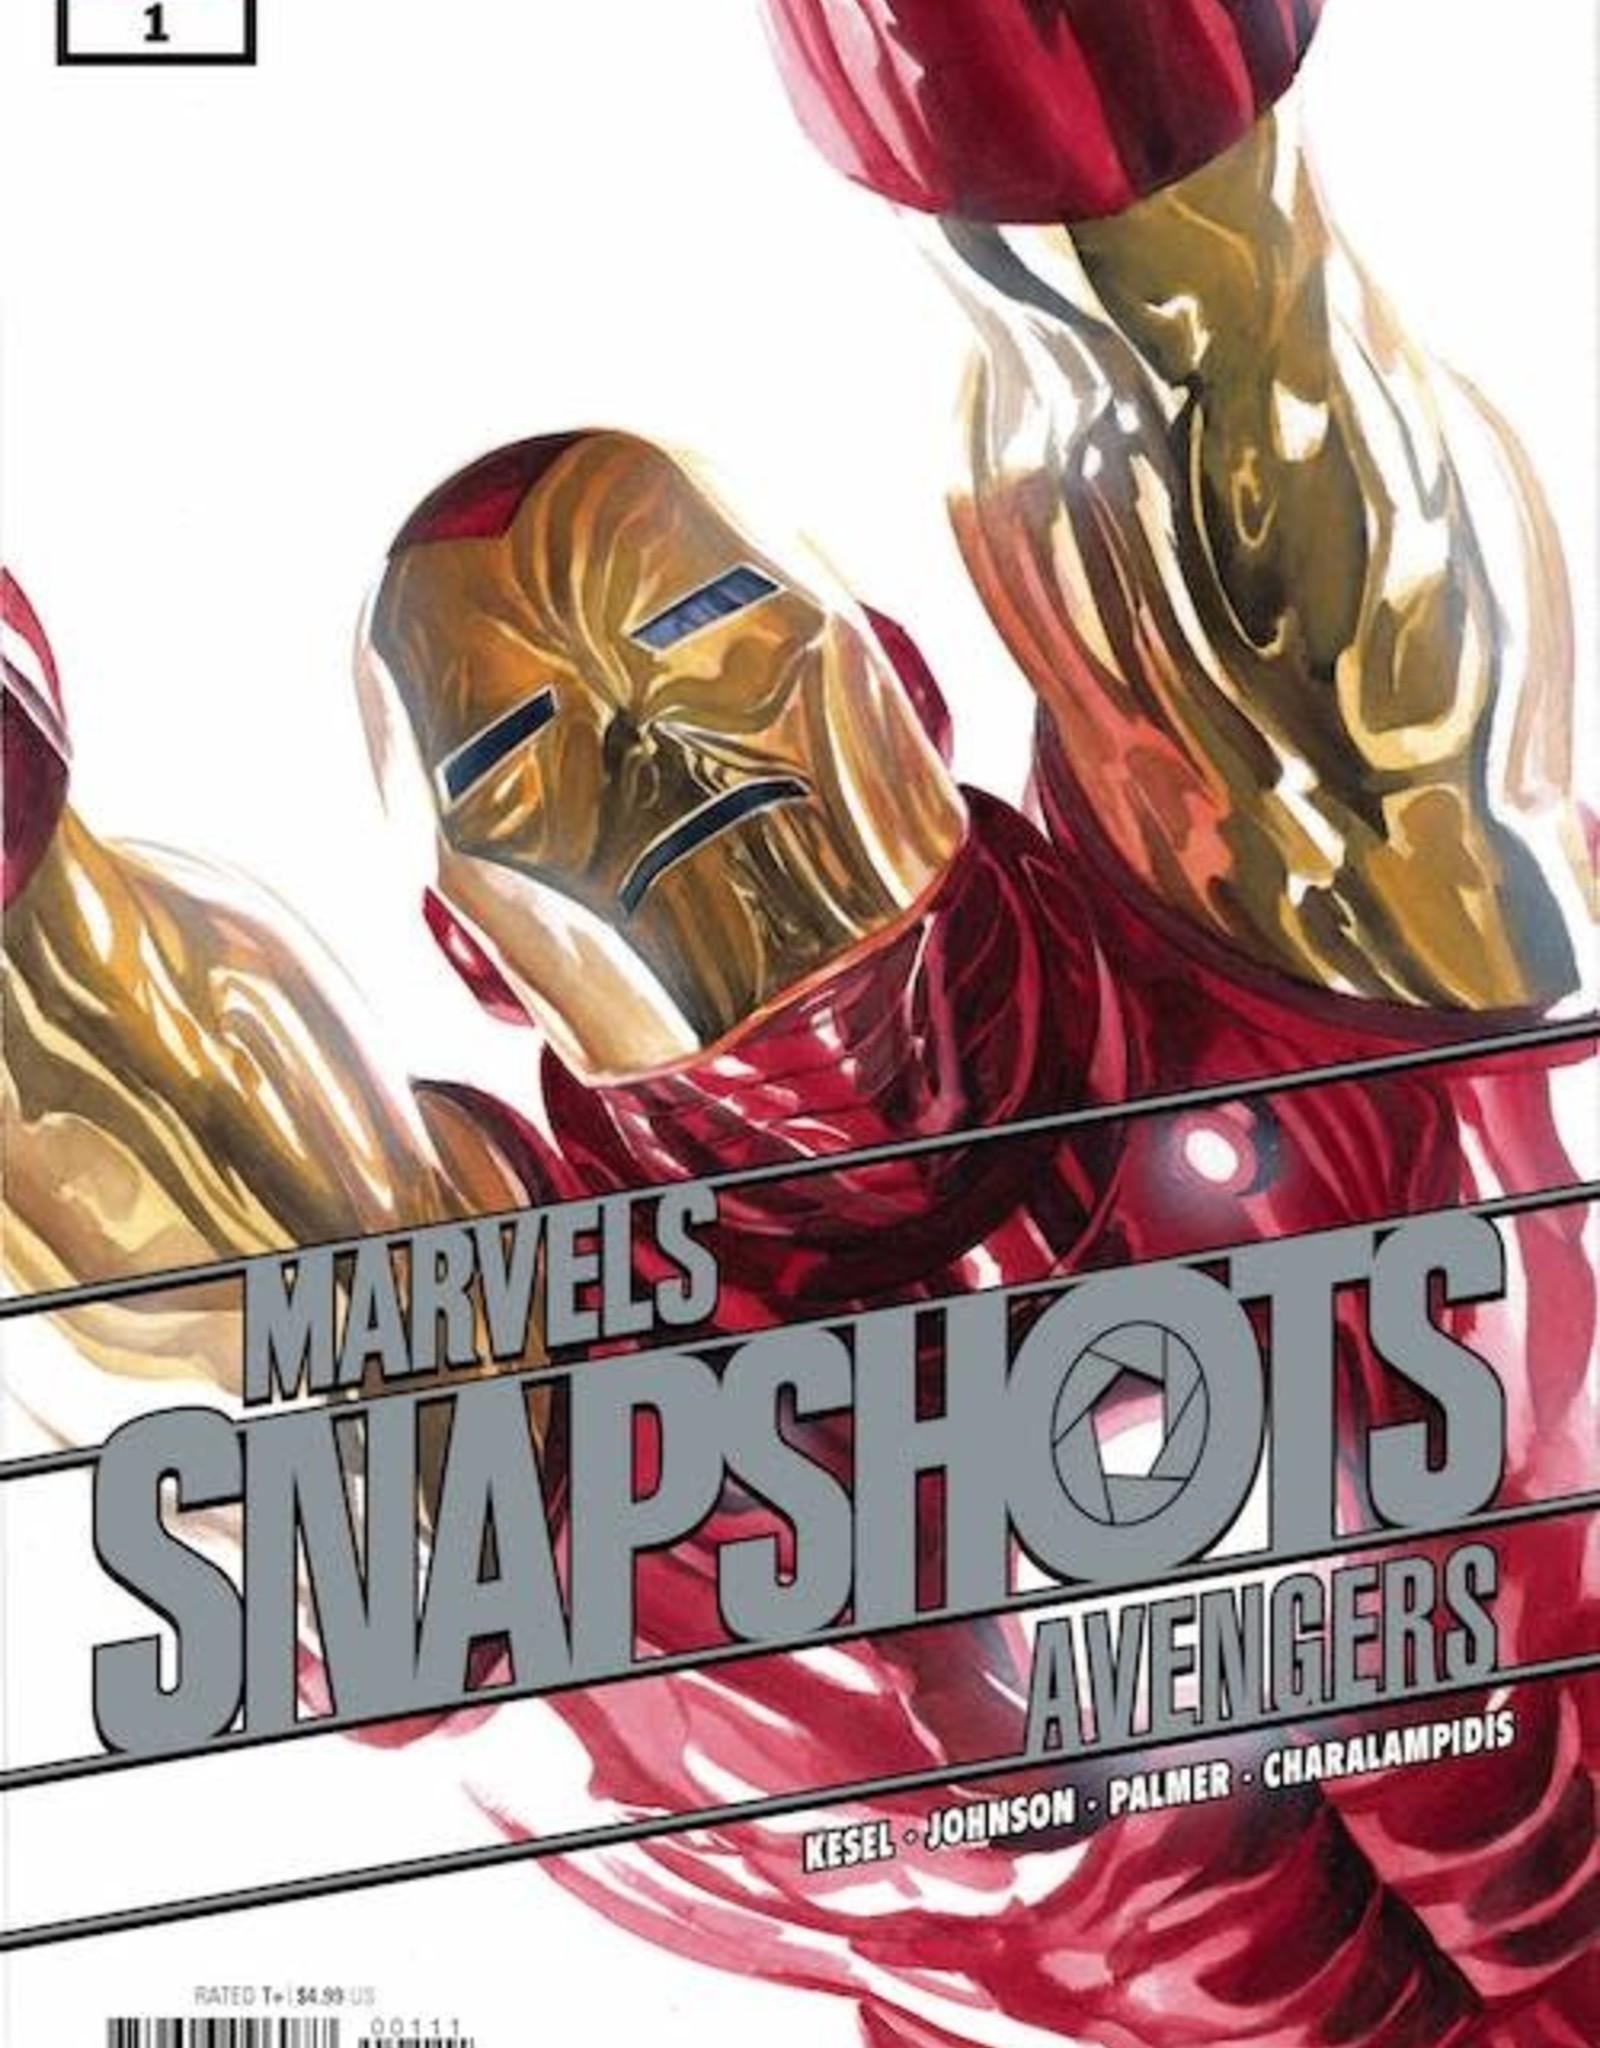 Marvel Comics Avengers Marvels Snapshot #1